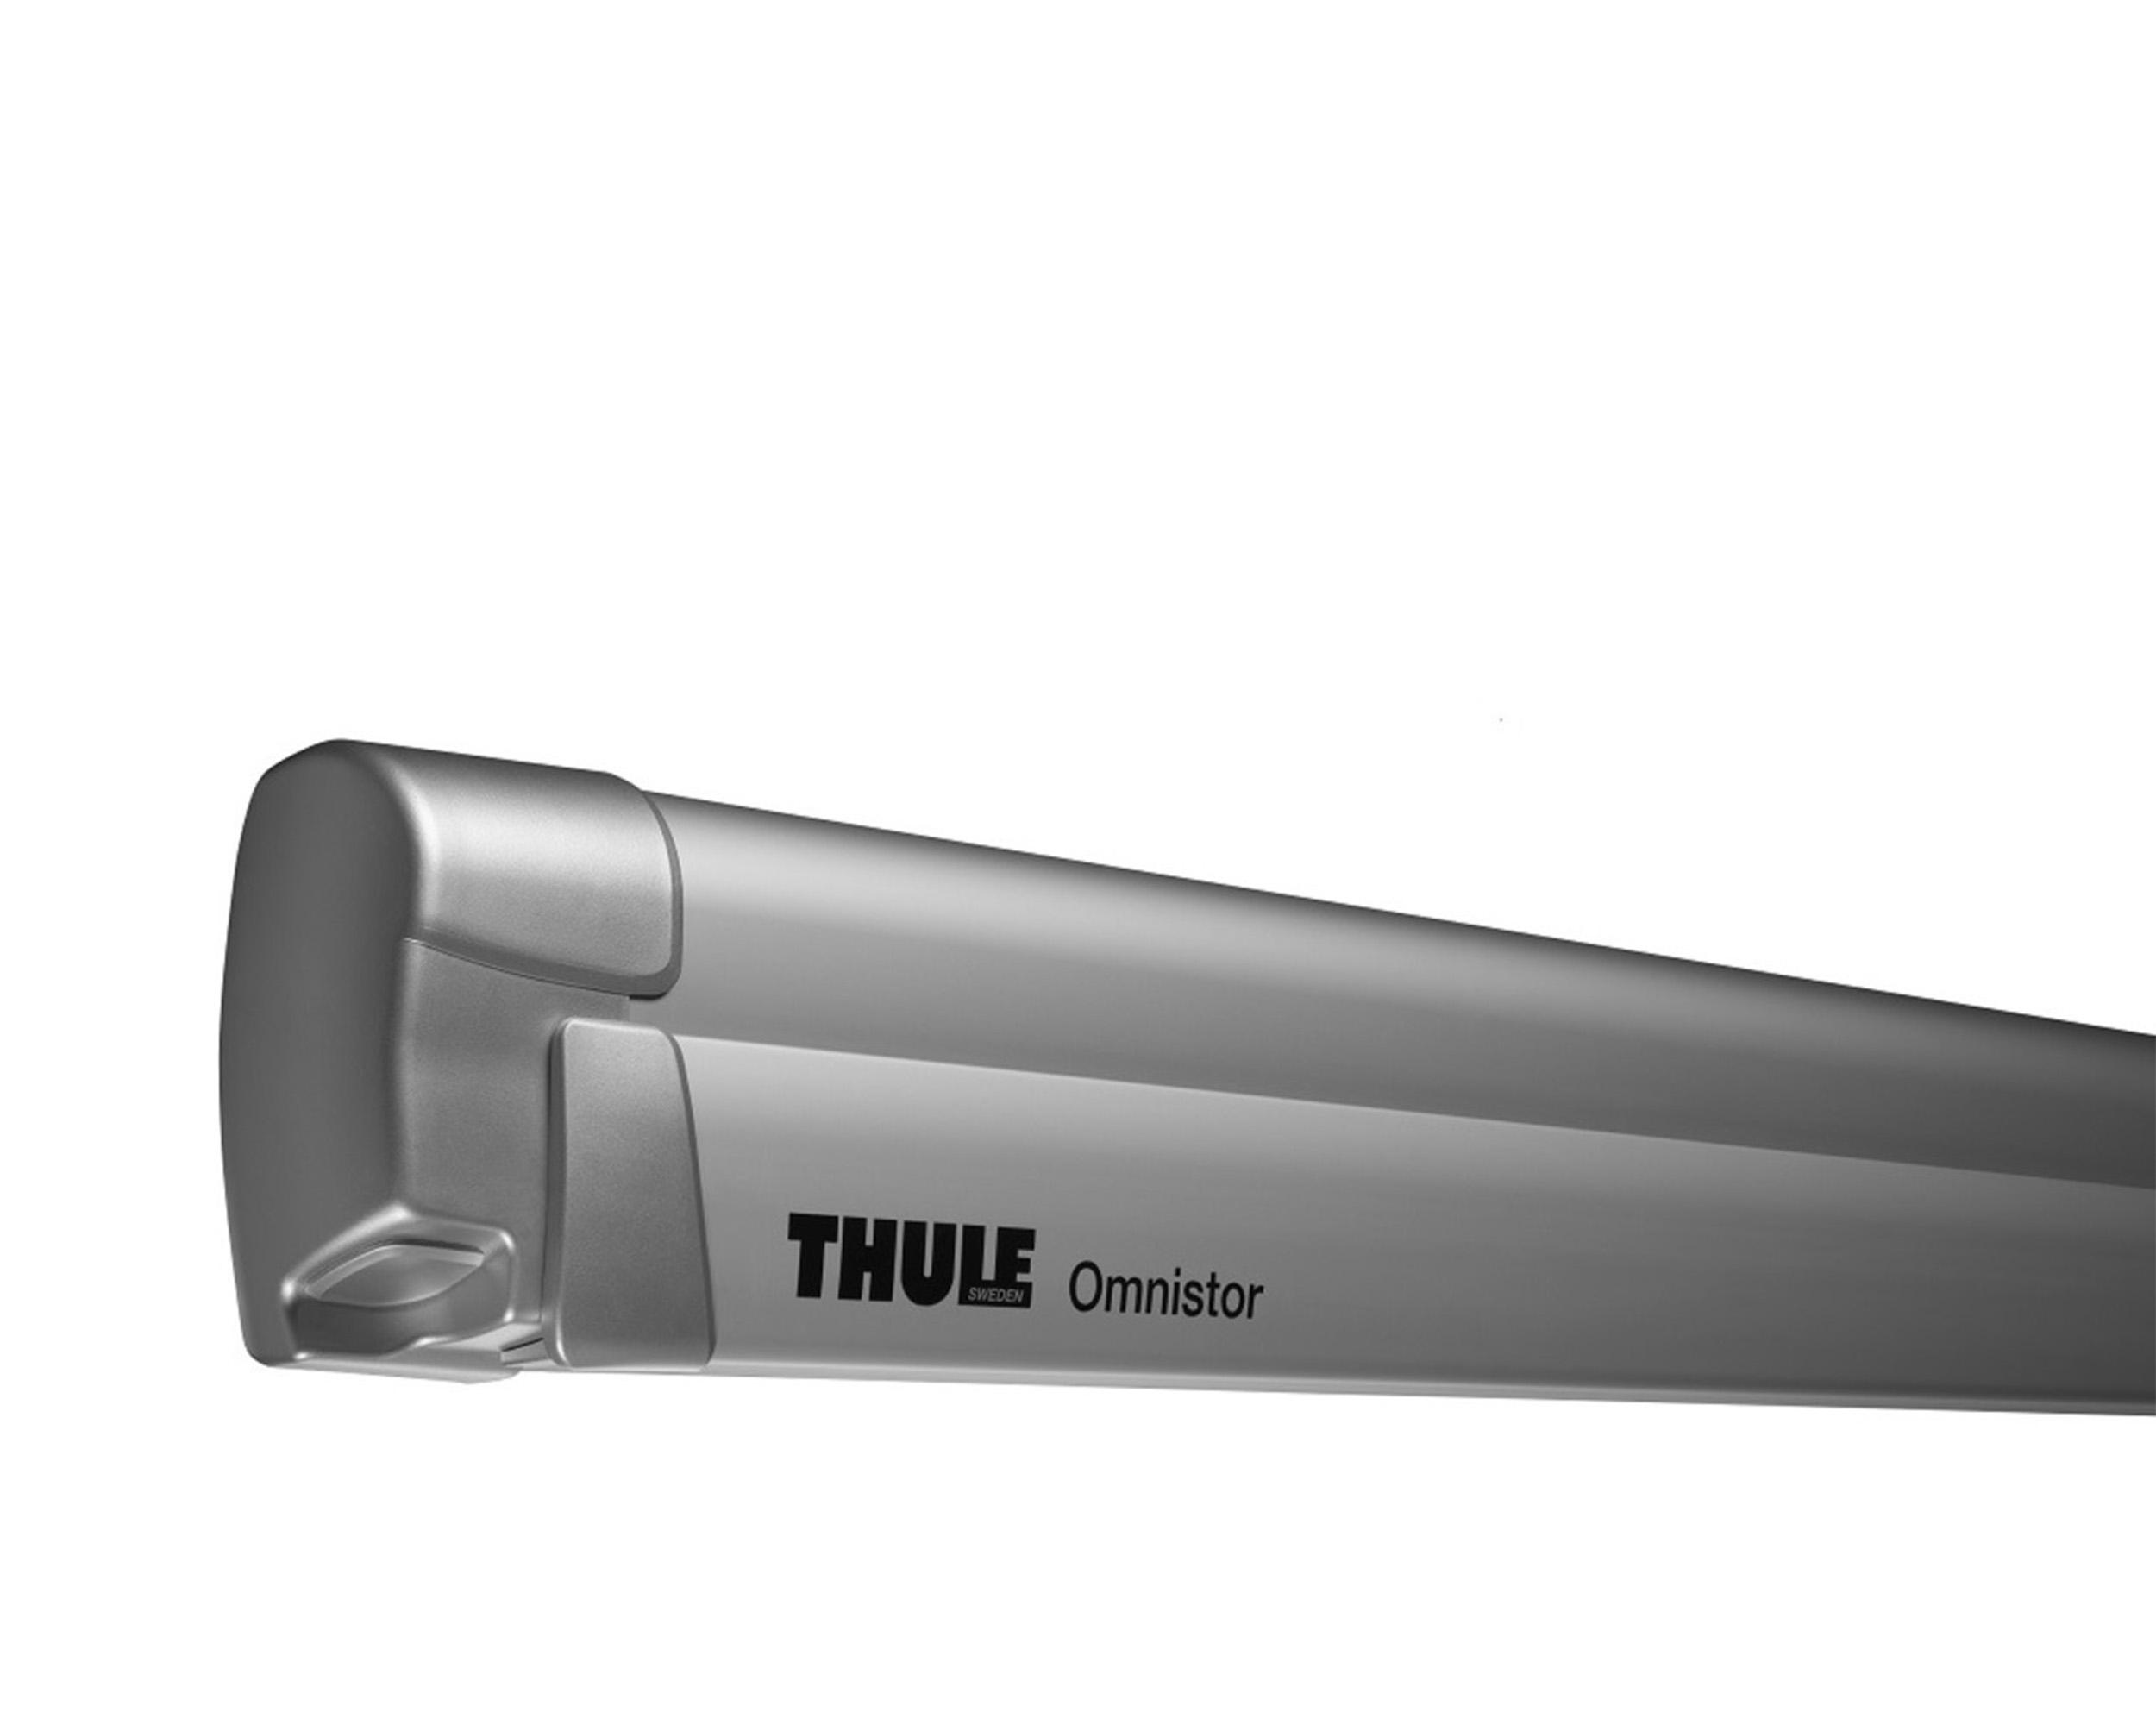 thule omnistor cassetteluifel 8000 grijs cannenburg